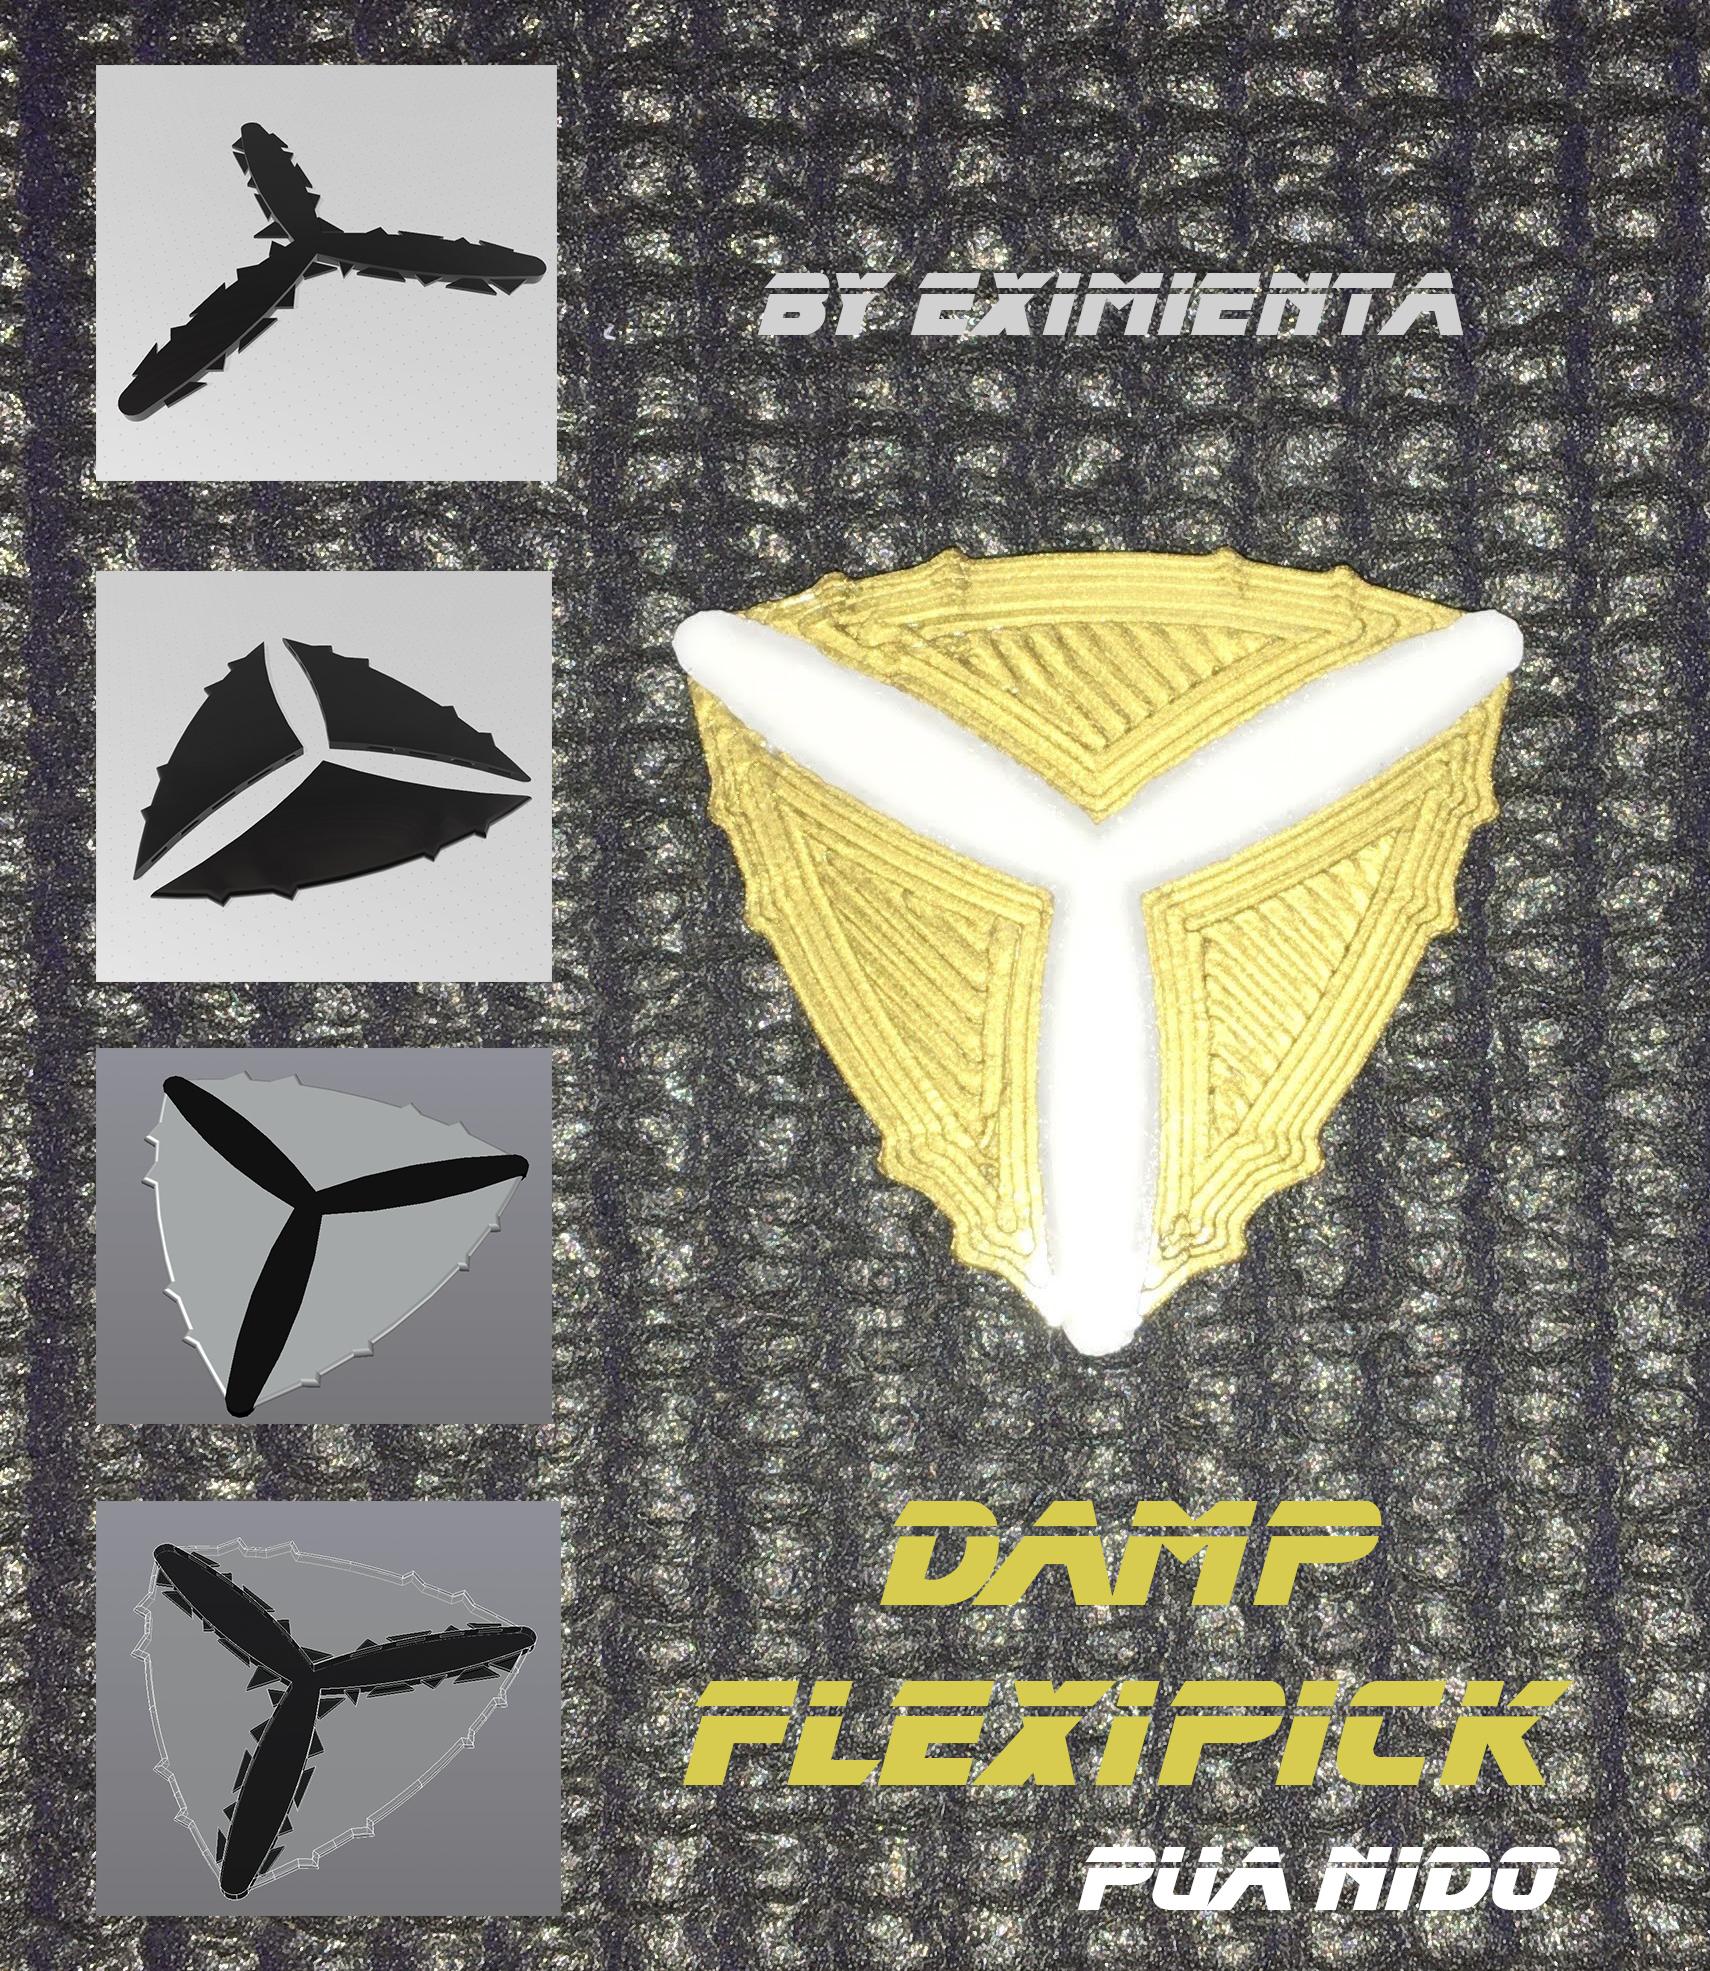 DAMP FlexiPick 09082020  pua nido by eXiMienTa imagen.jpg Download free STL file DAMP FlexiPick pua nido by eXiMienTa • Model to 3D print, carleslluisar